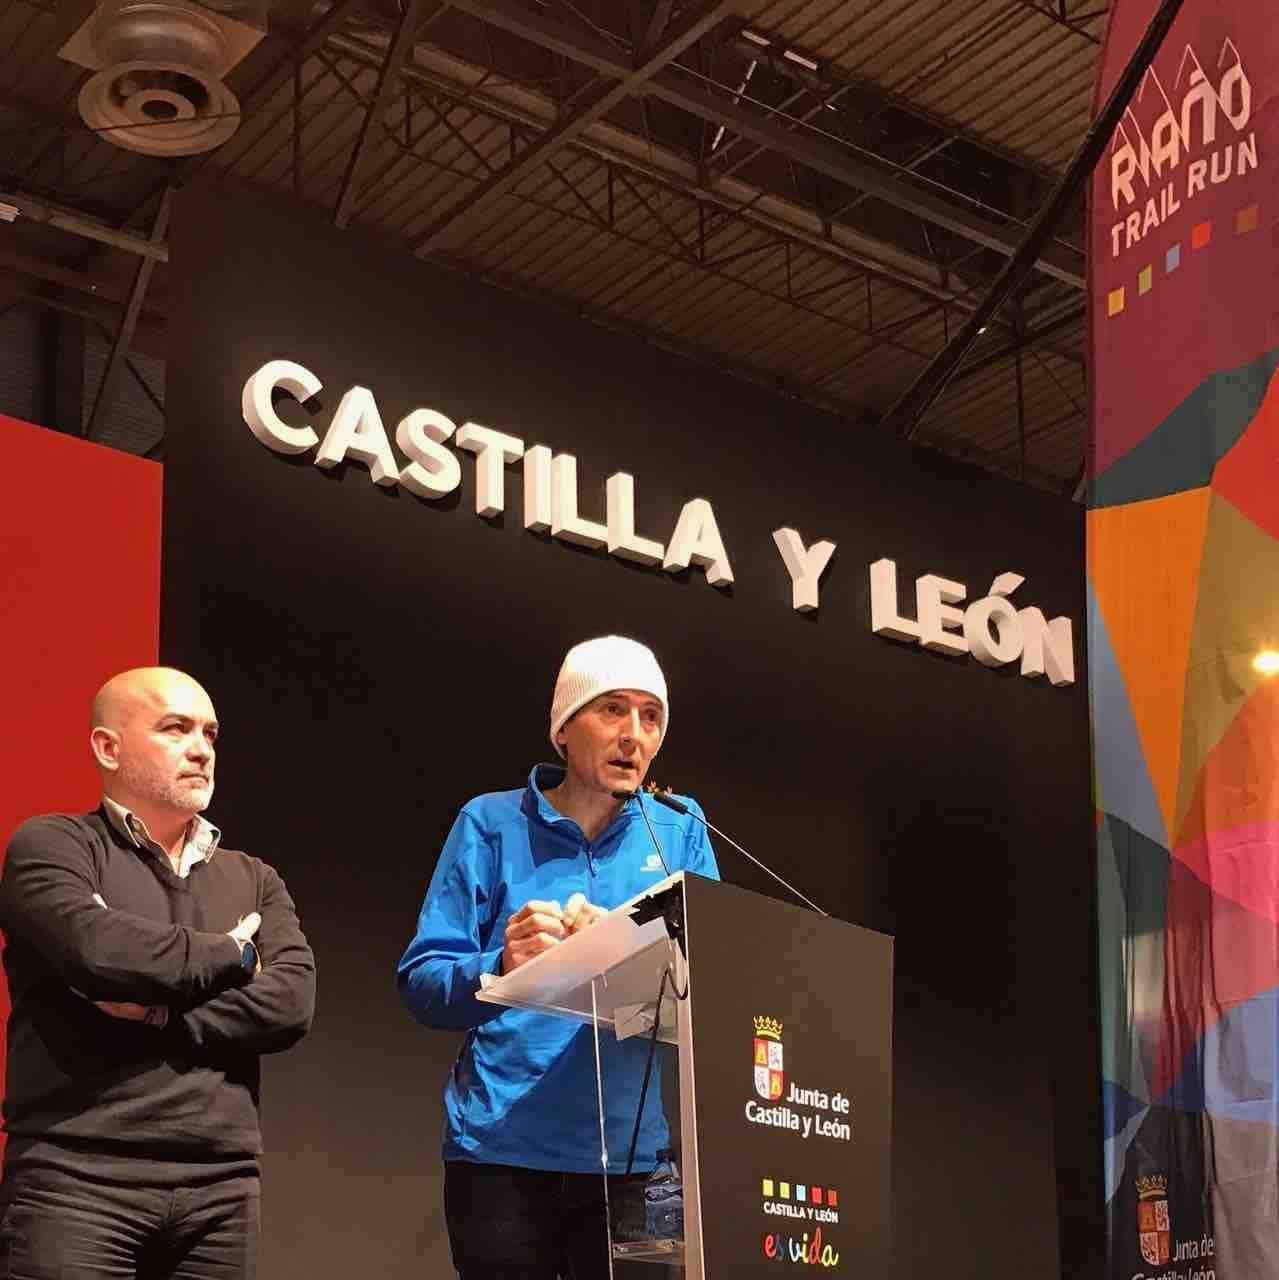 Presentación Riaño Trail Run_Miguel Heras